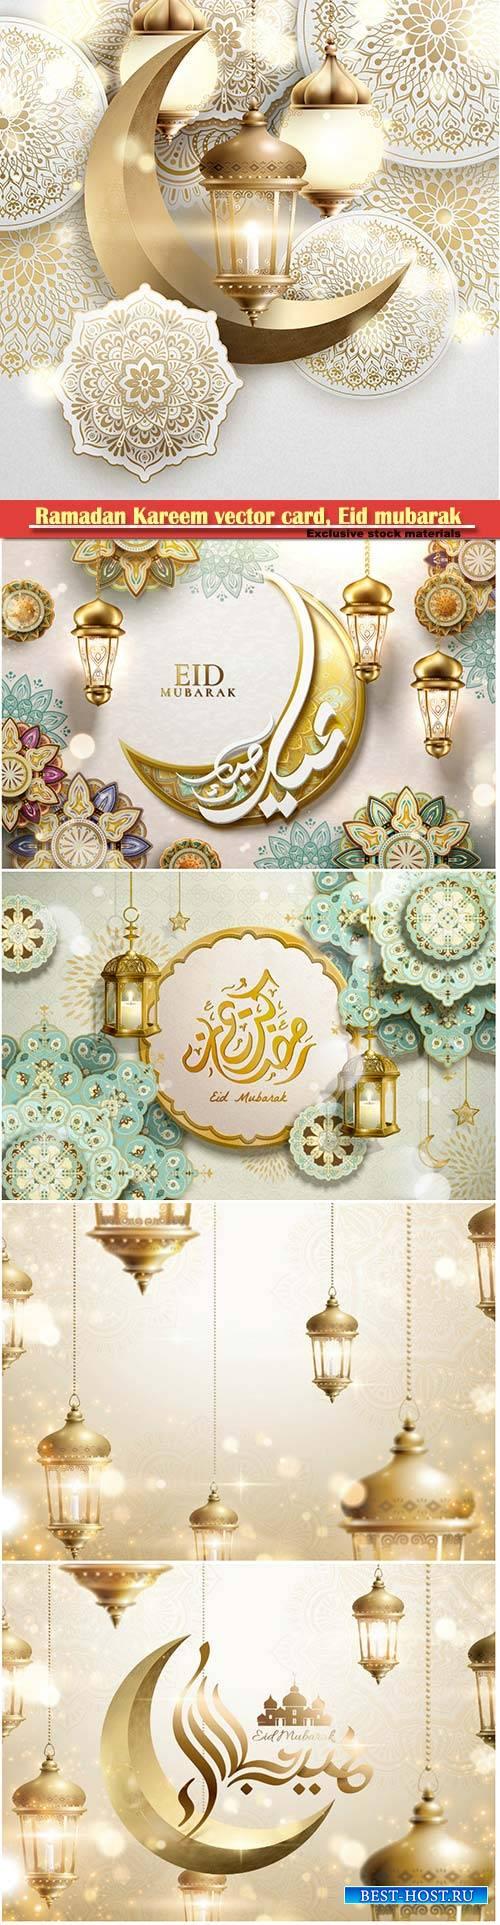 Ramadan Kareem vector card, Eid mubarak calligraphy design templates # 18